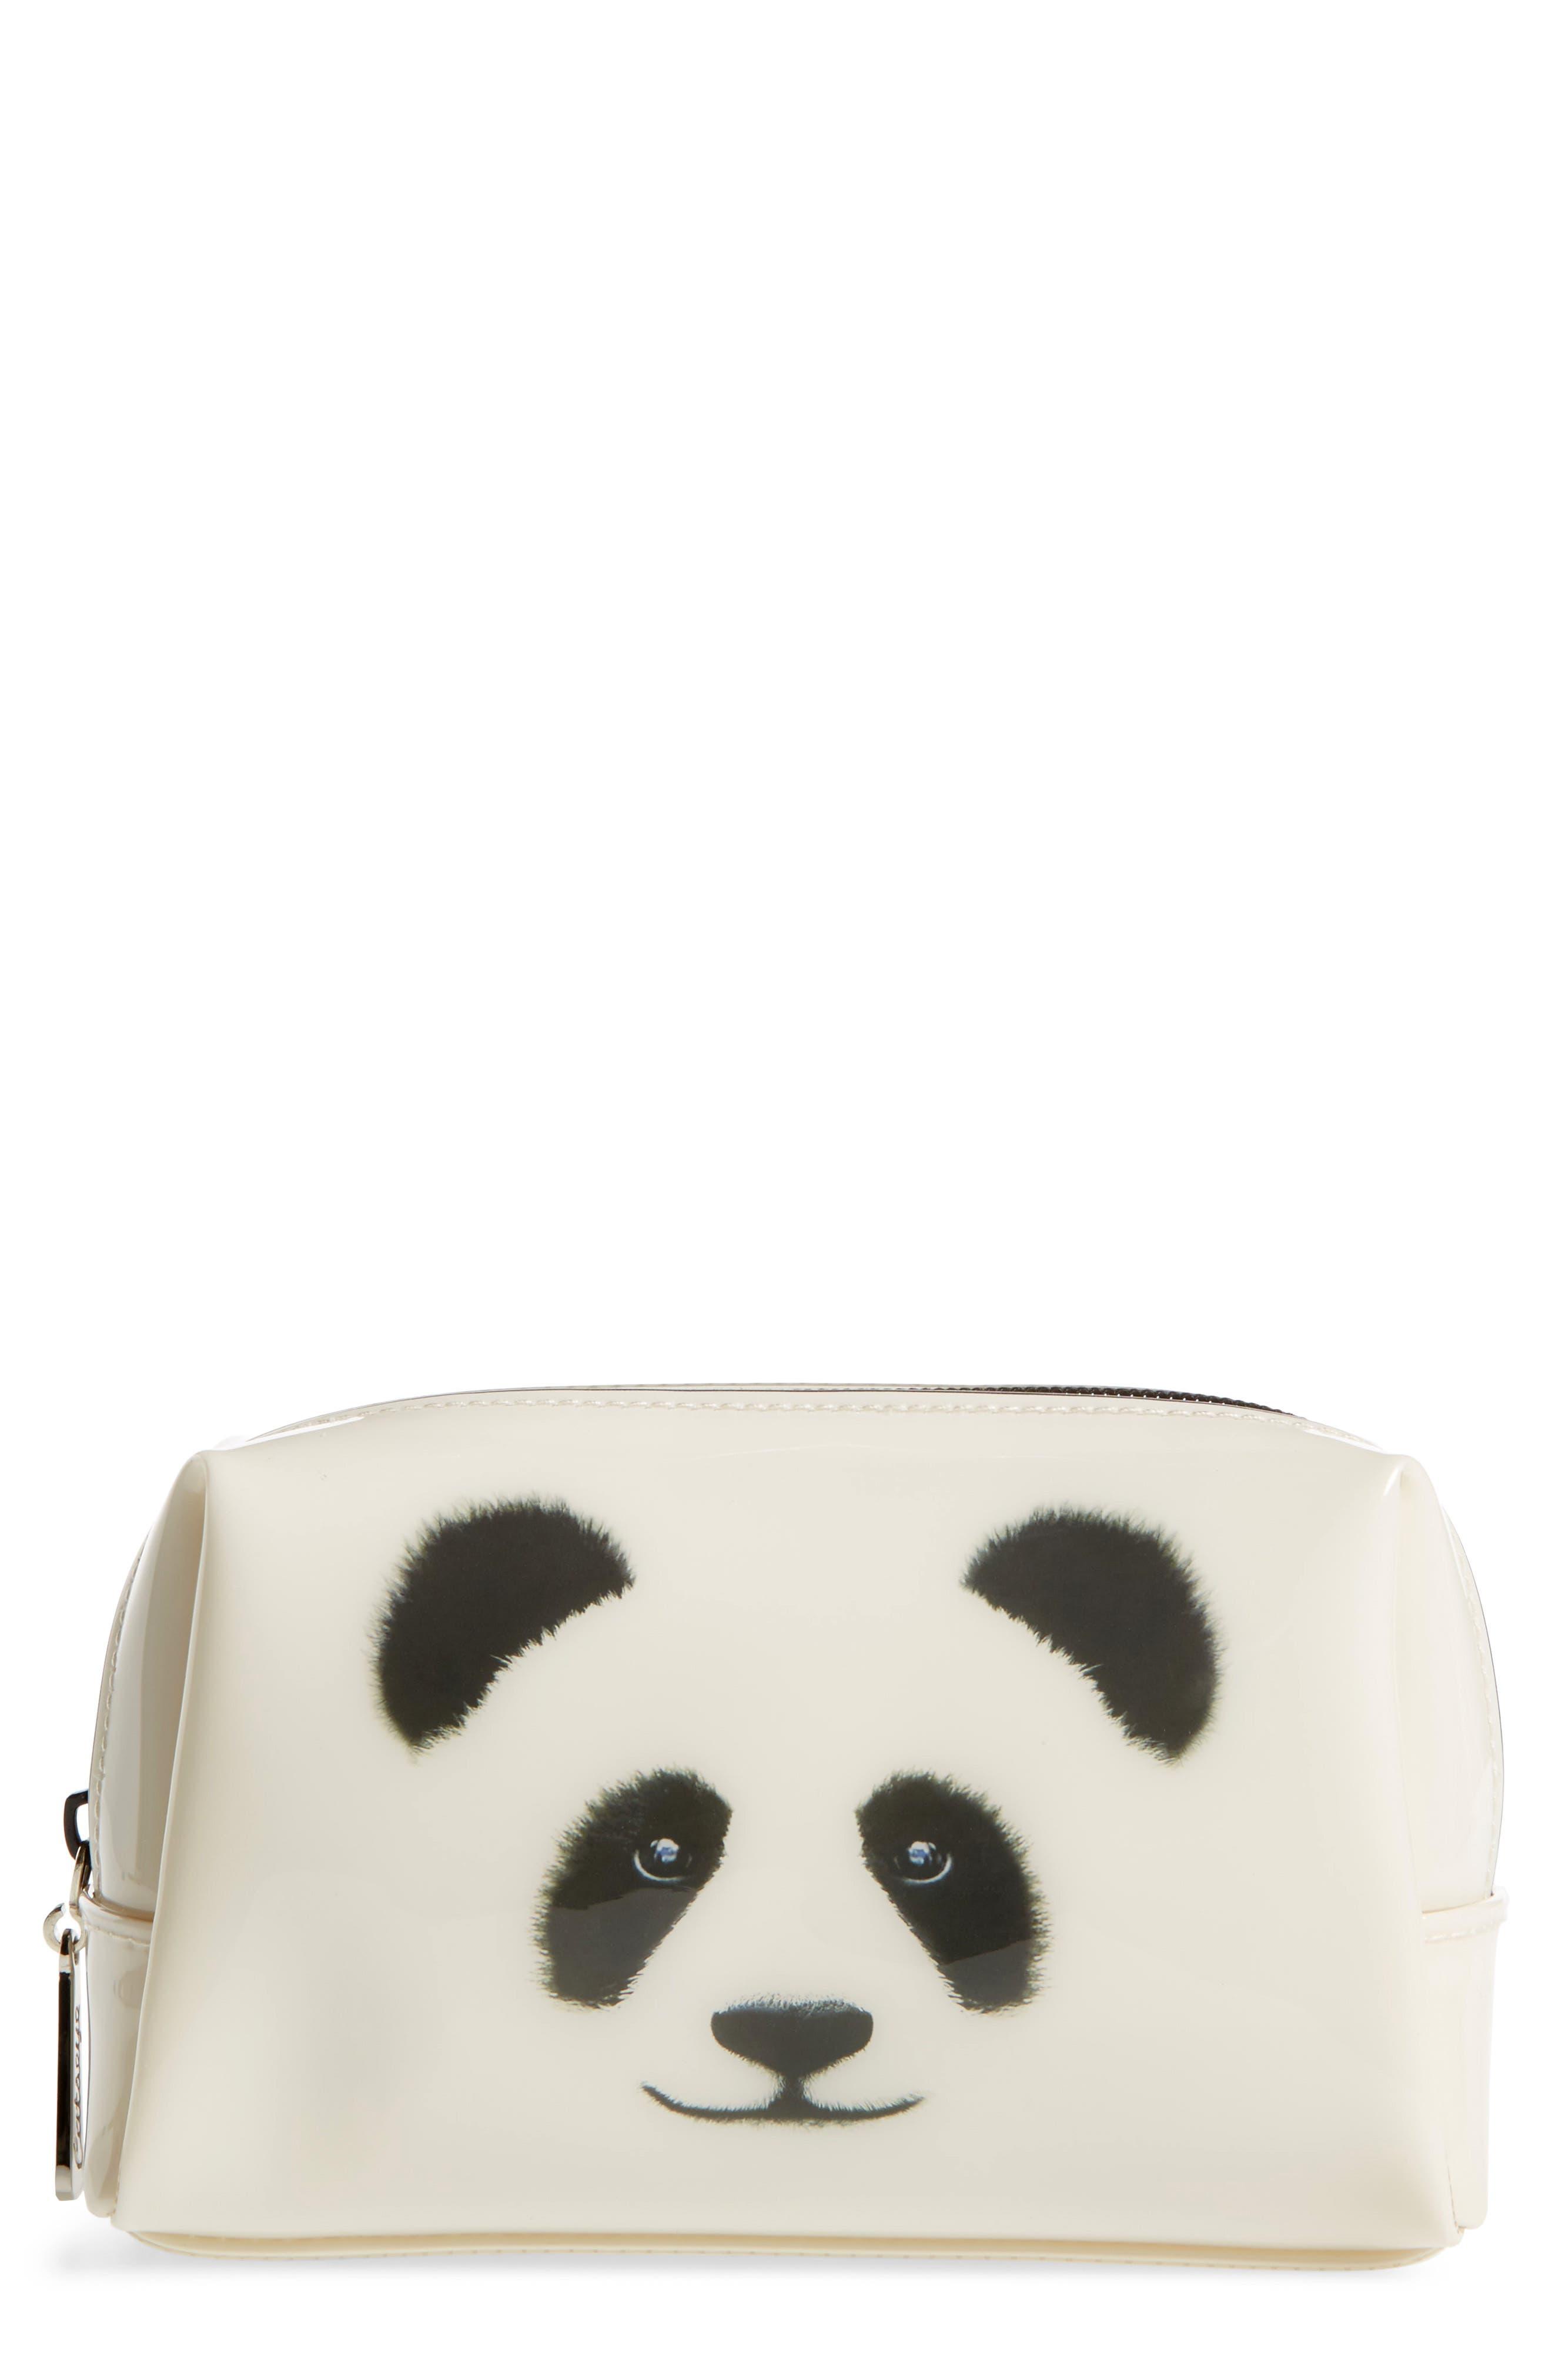 Alternate Image 1 Selected - Catseye London Monochrome Panda Cosmetics Case